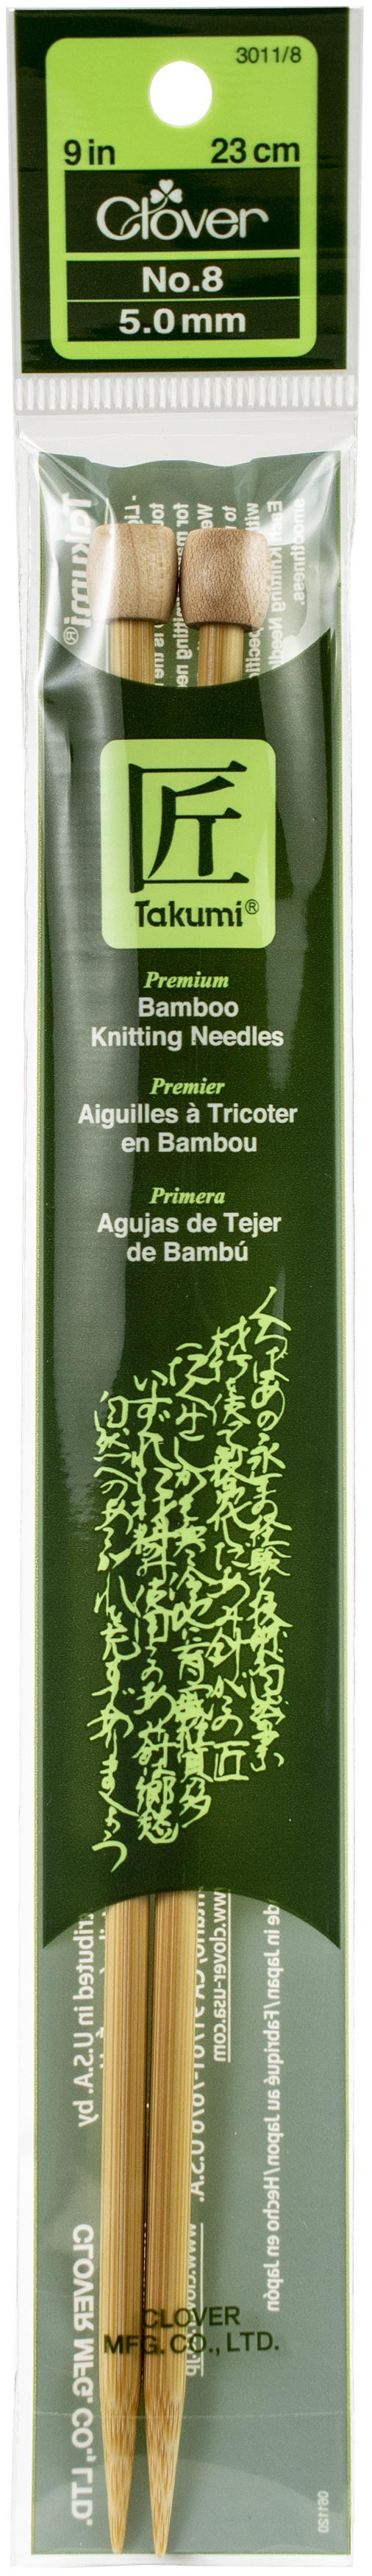 Takumi Bamboo Single Point Knitting Needles 9-Size 8/5mm